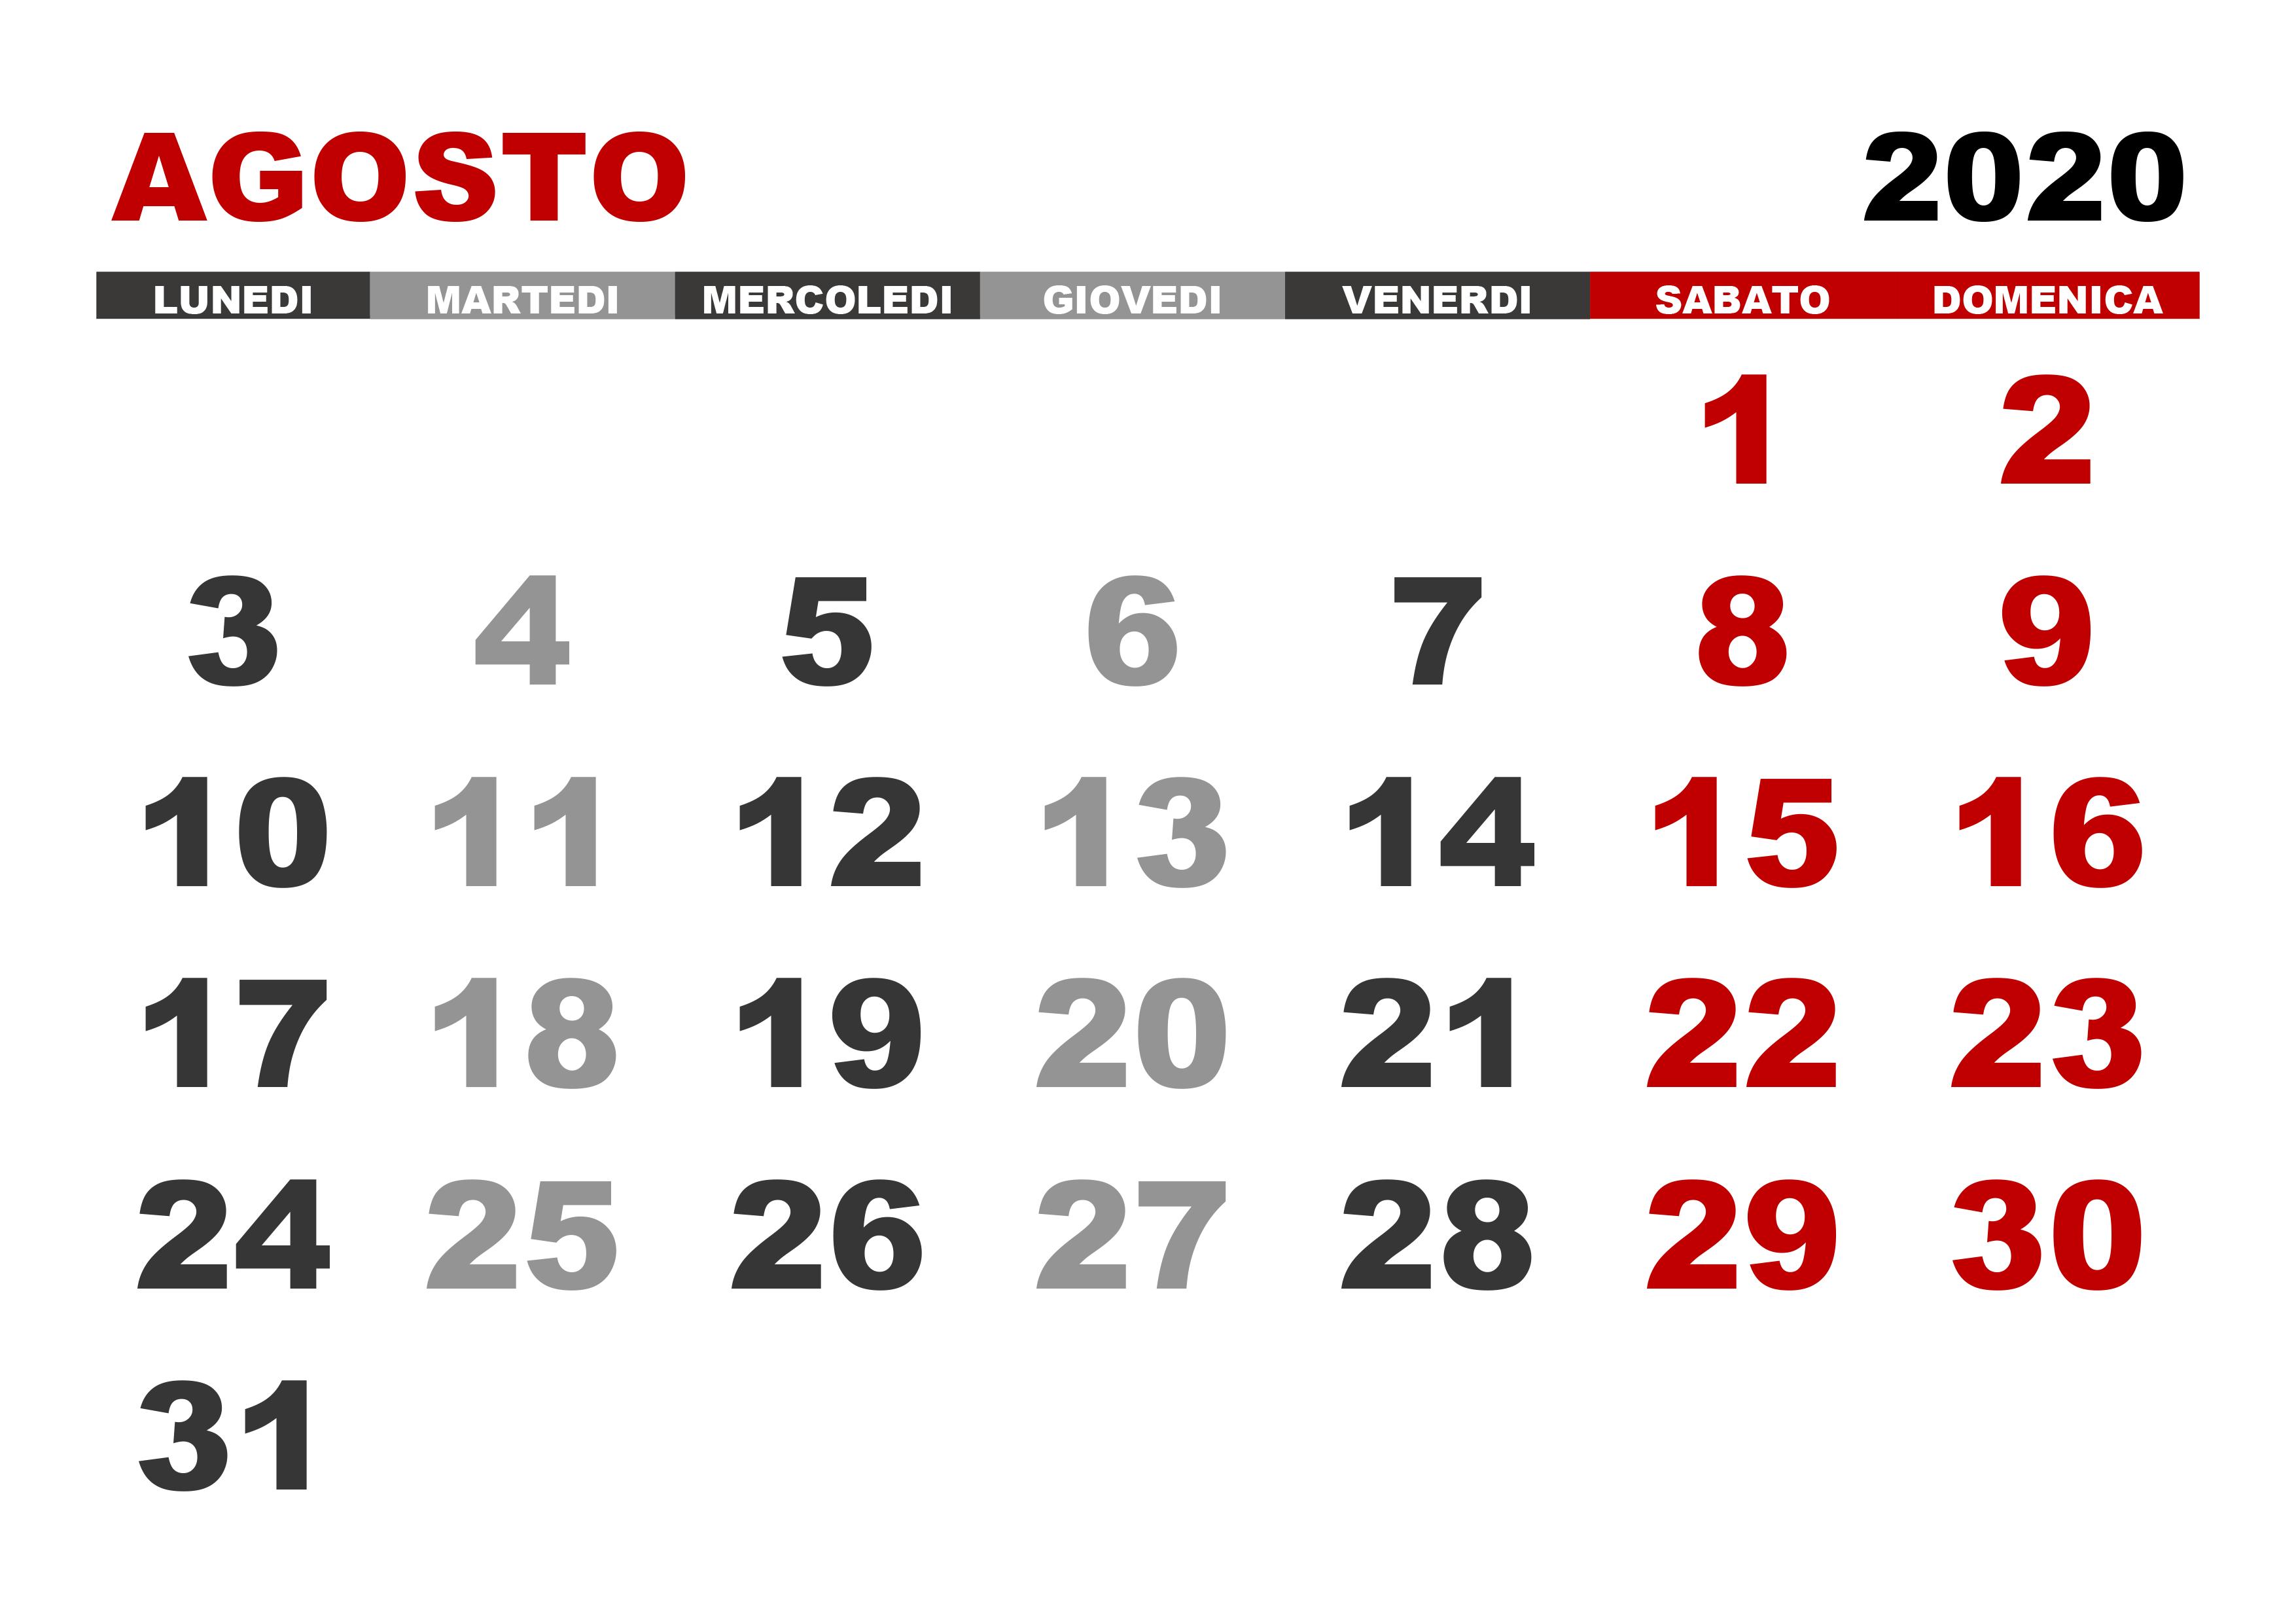 Calendario Di Agosto 2020.Calendario Agosto 2020 Calendario Su